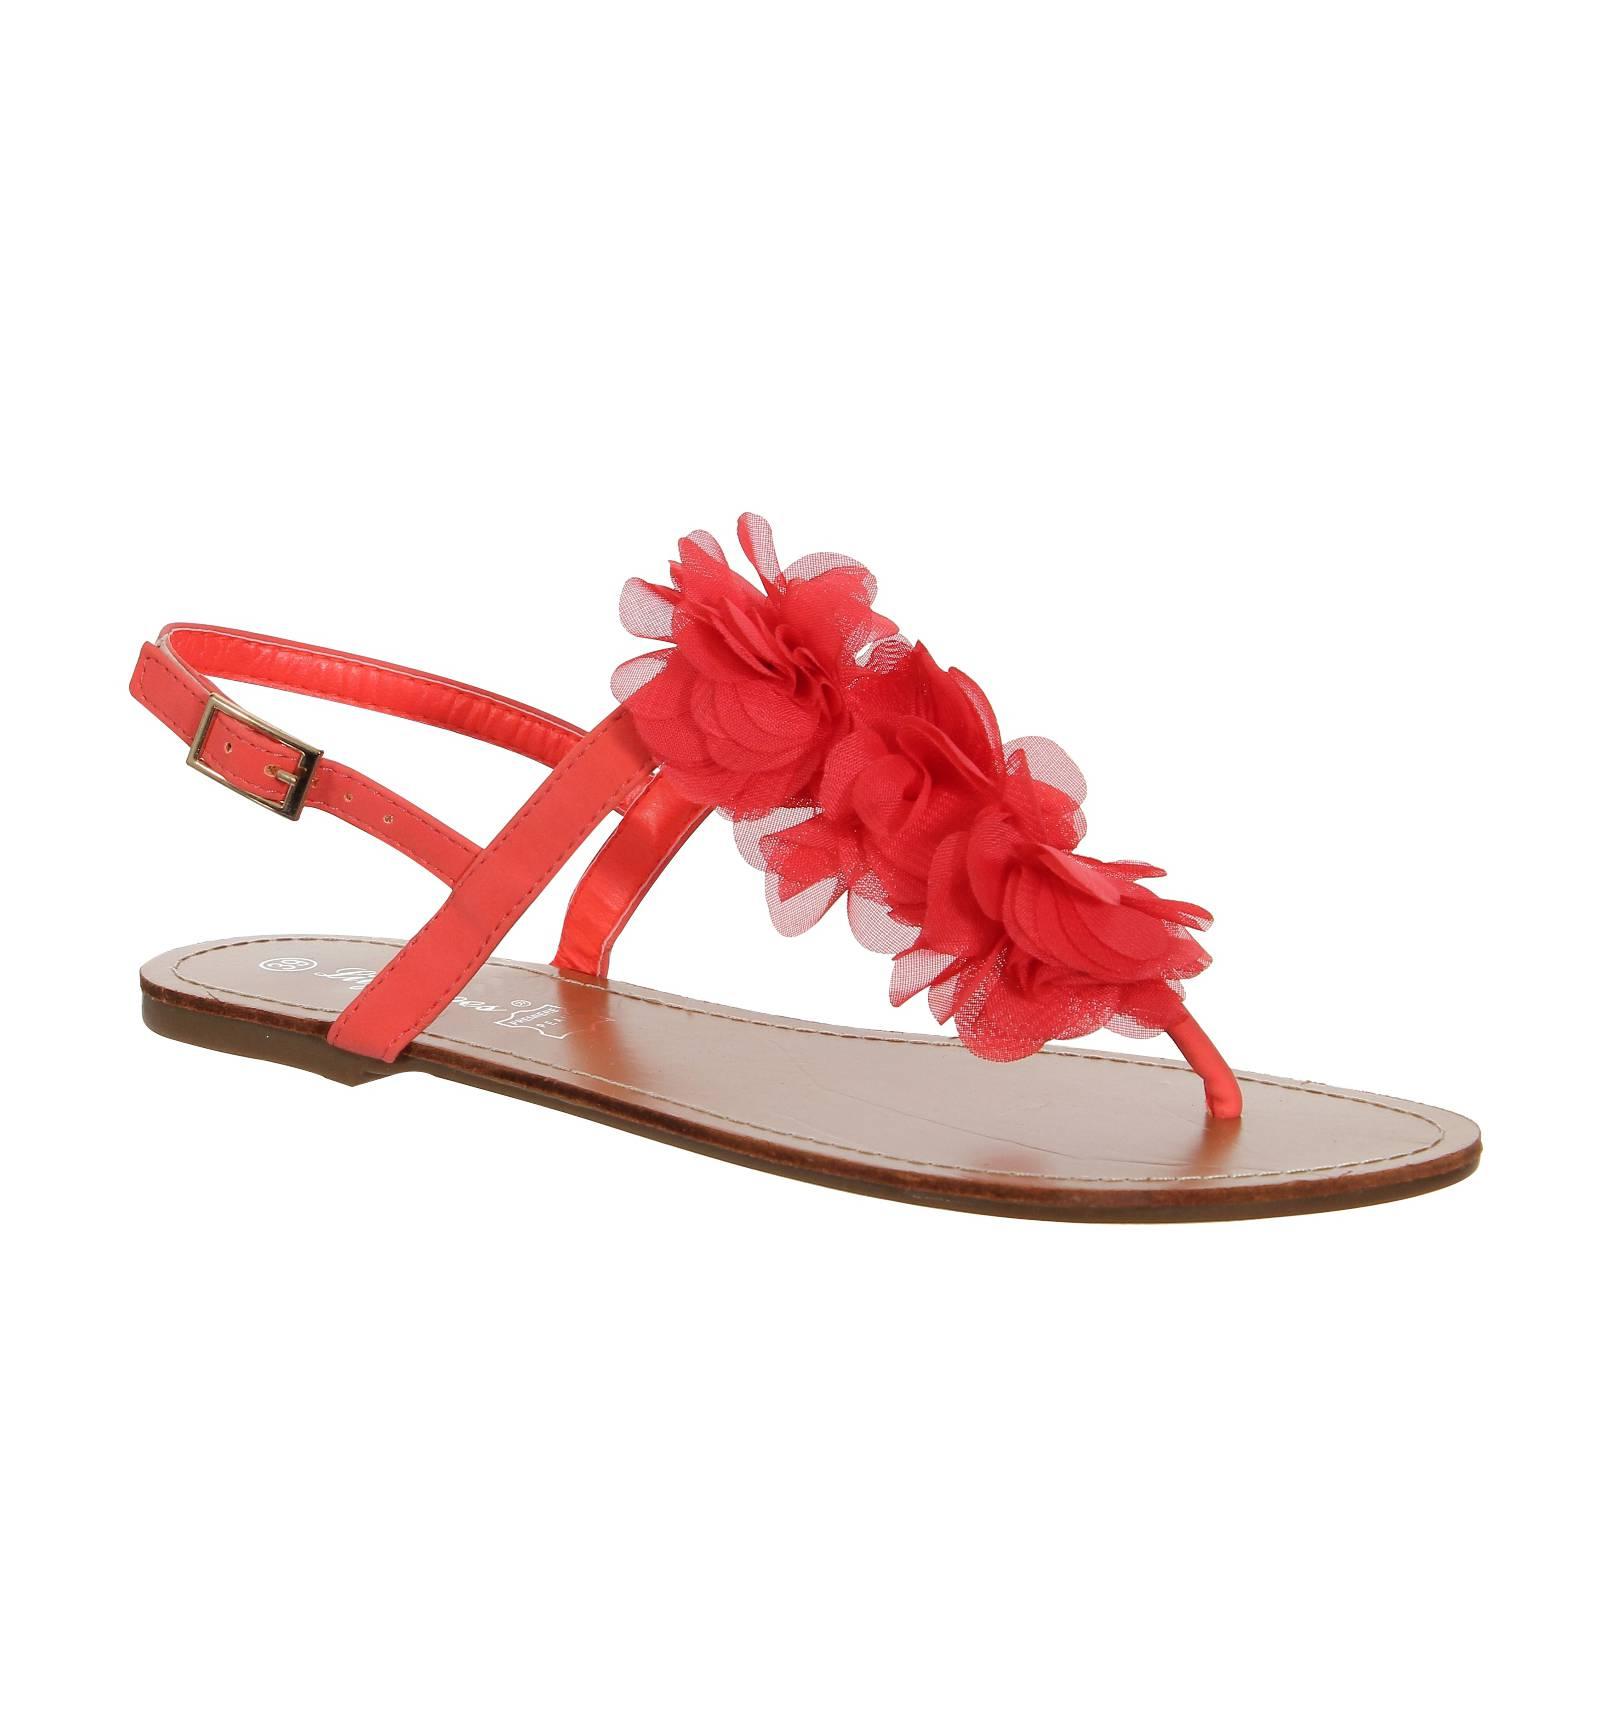 Sandale plate femme fleur